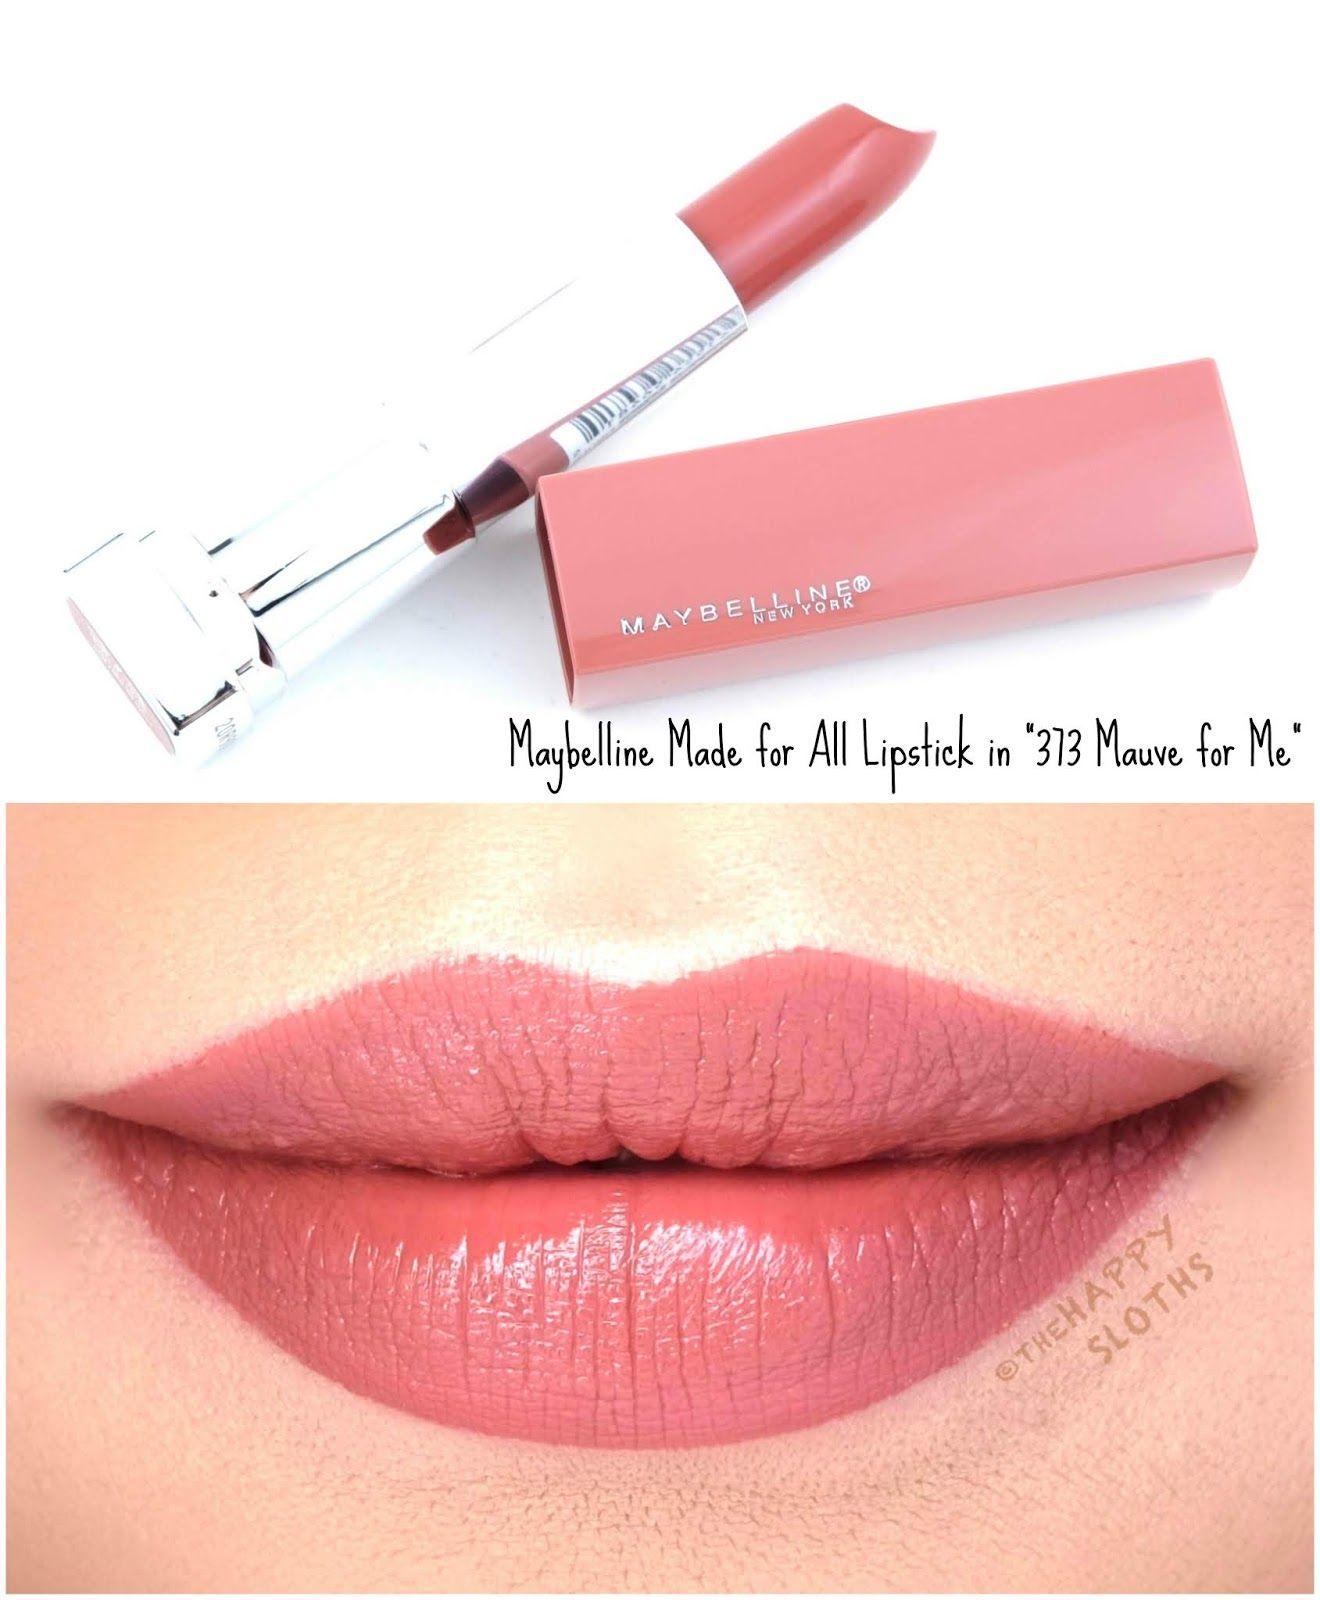 Maybelline Lip Colors Maybelline Lipstick Lipstick